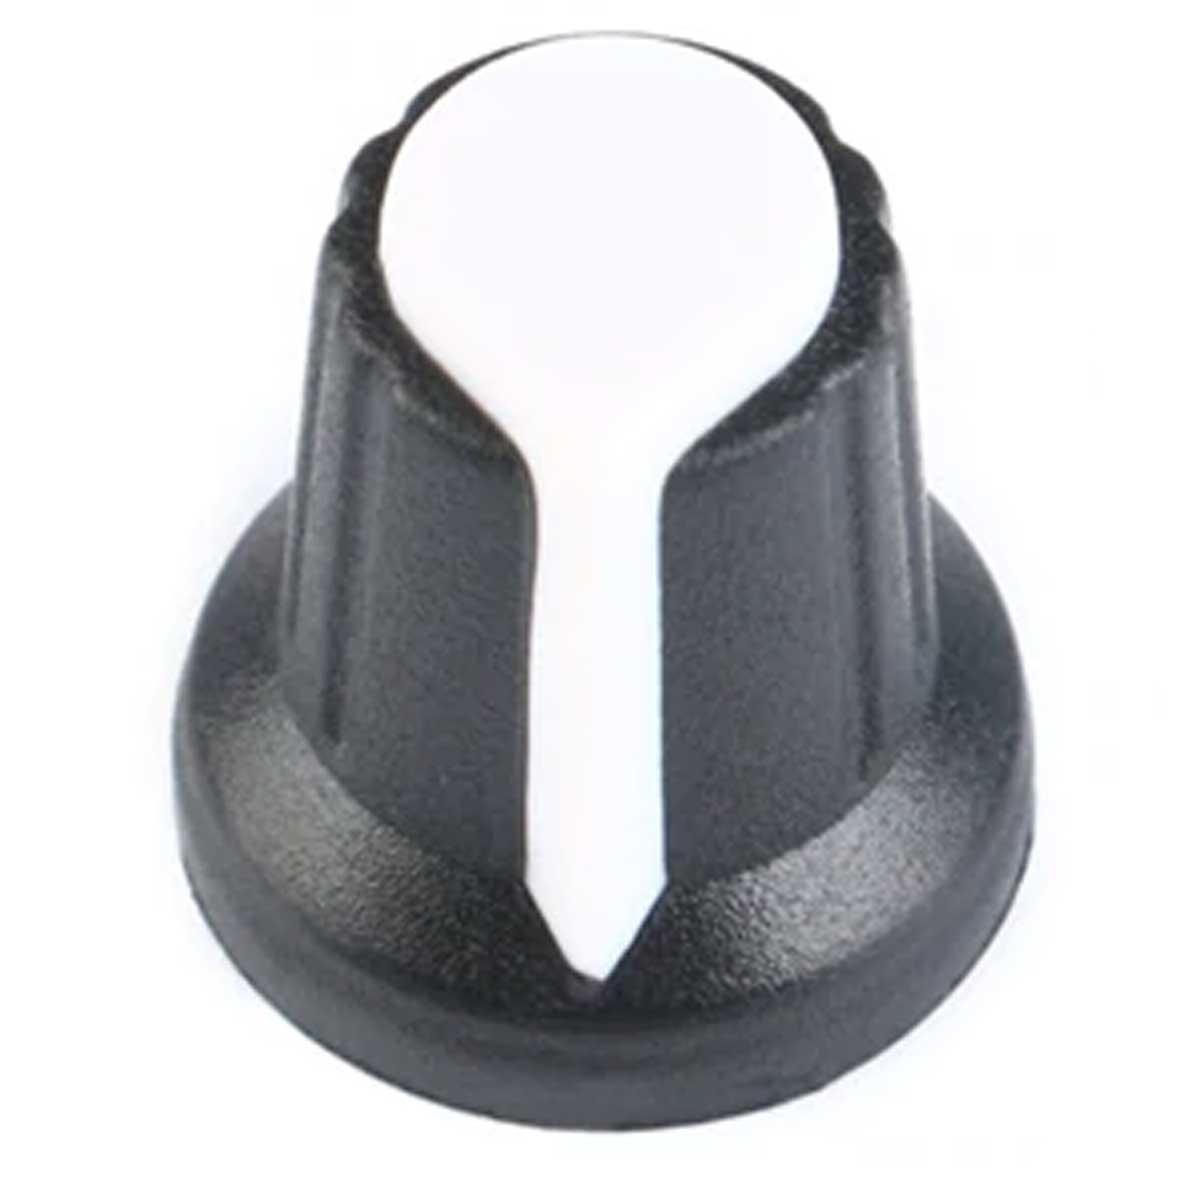 Knob para Potenciômetro Estriado 6mm Botão Volume - Branco